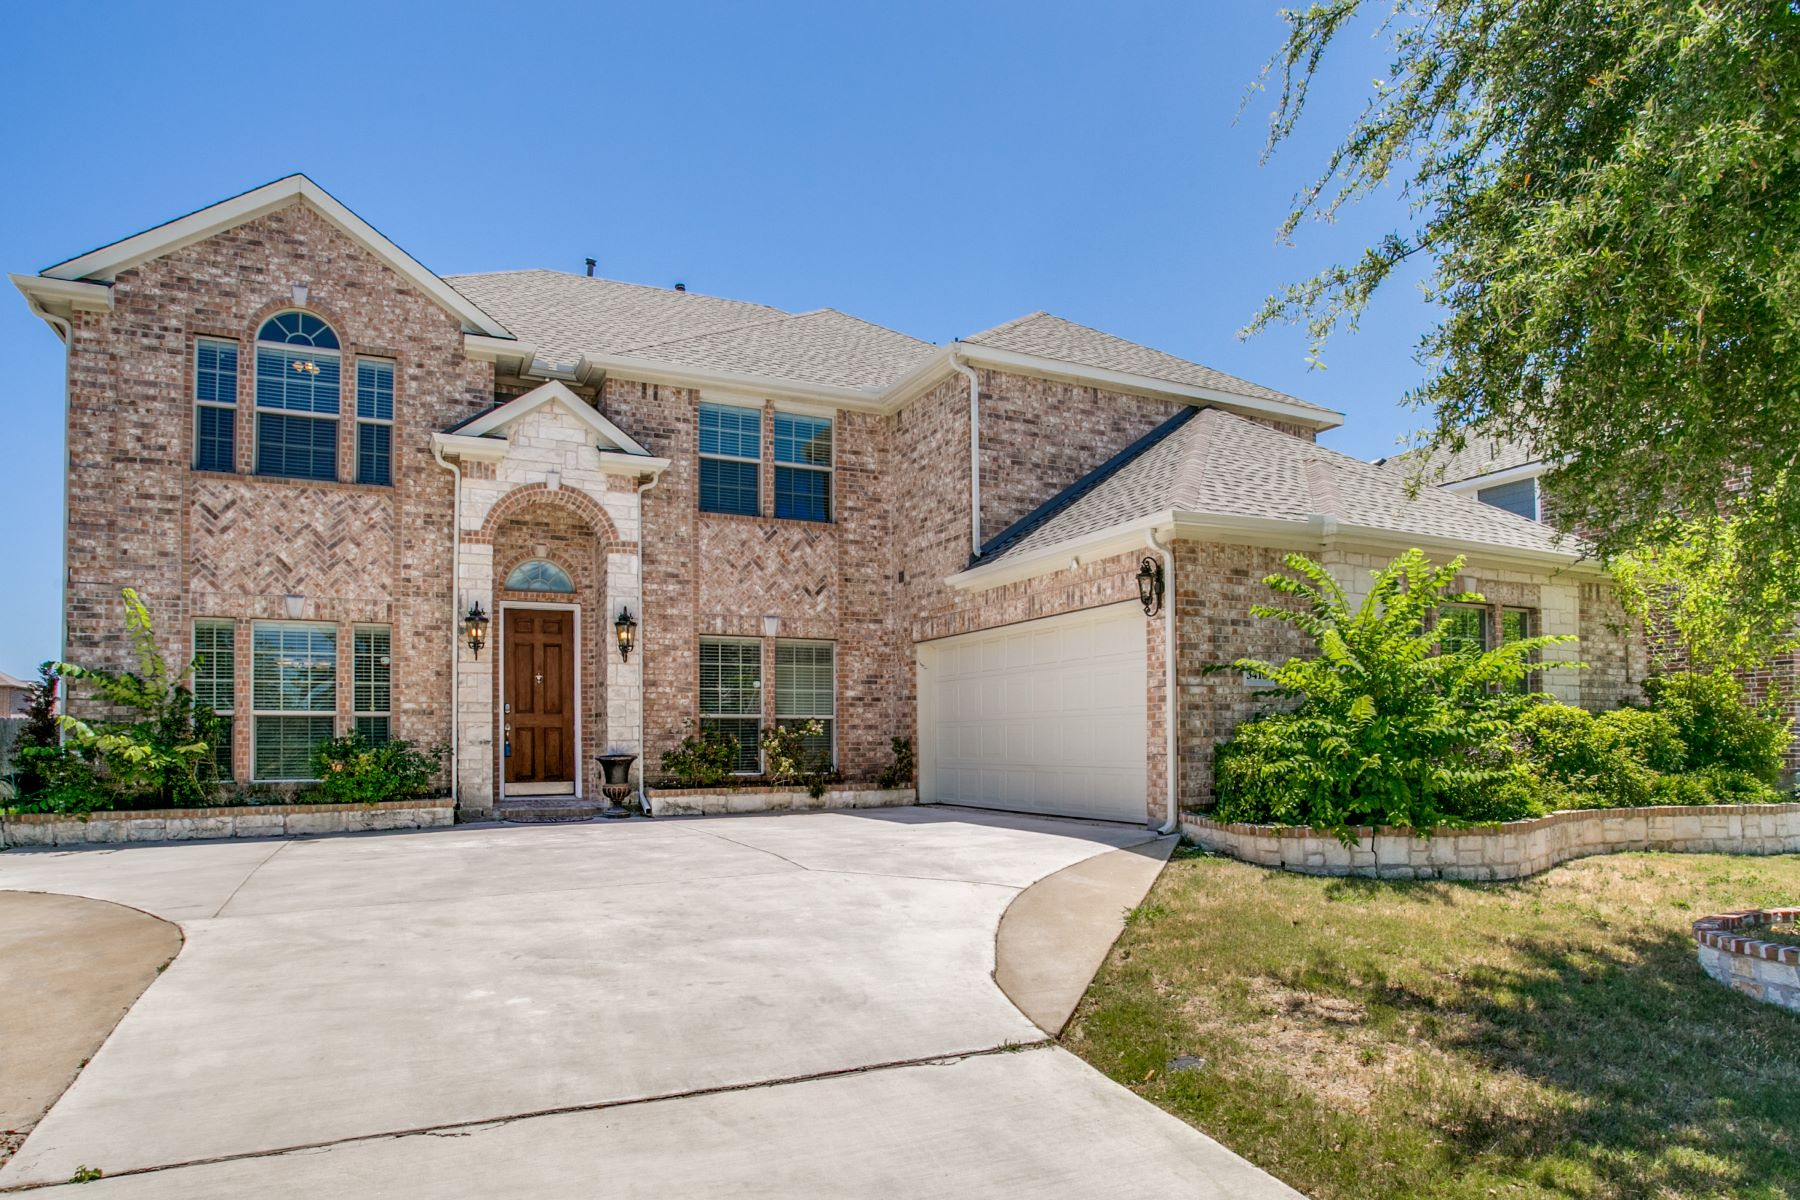 Single Family Homes für Verkauf beim Your Dream Home Awaits in this Classic Brick Home 3410 Texas Drive, Sachse, Texas 75048 Vereinigte Staaten